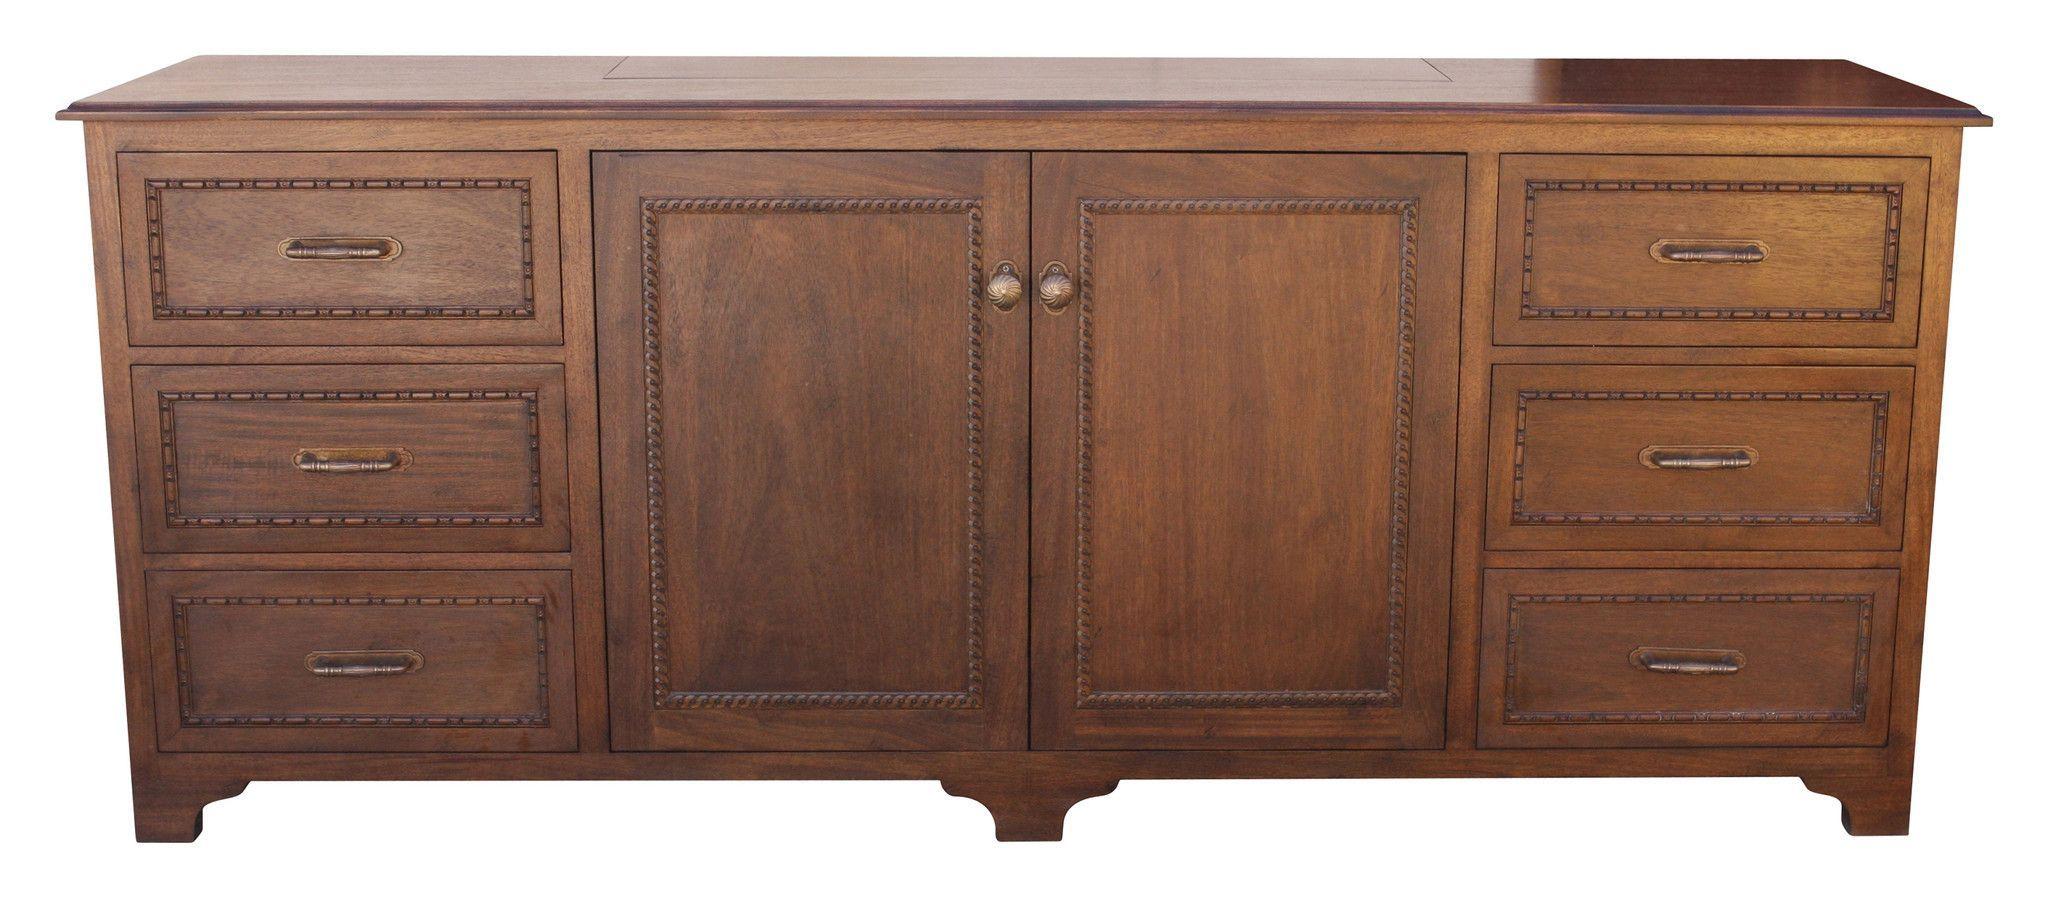 One Kings Lane Beulah 3-Door Cabinet - Pecan In 2019 for Chaffins Sideboards (Image 26 of 30)